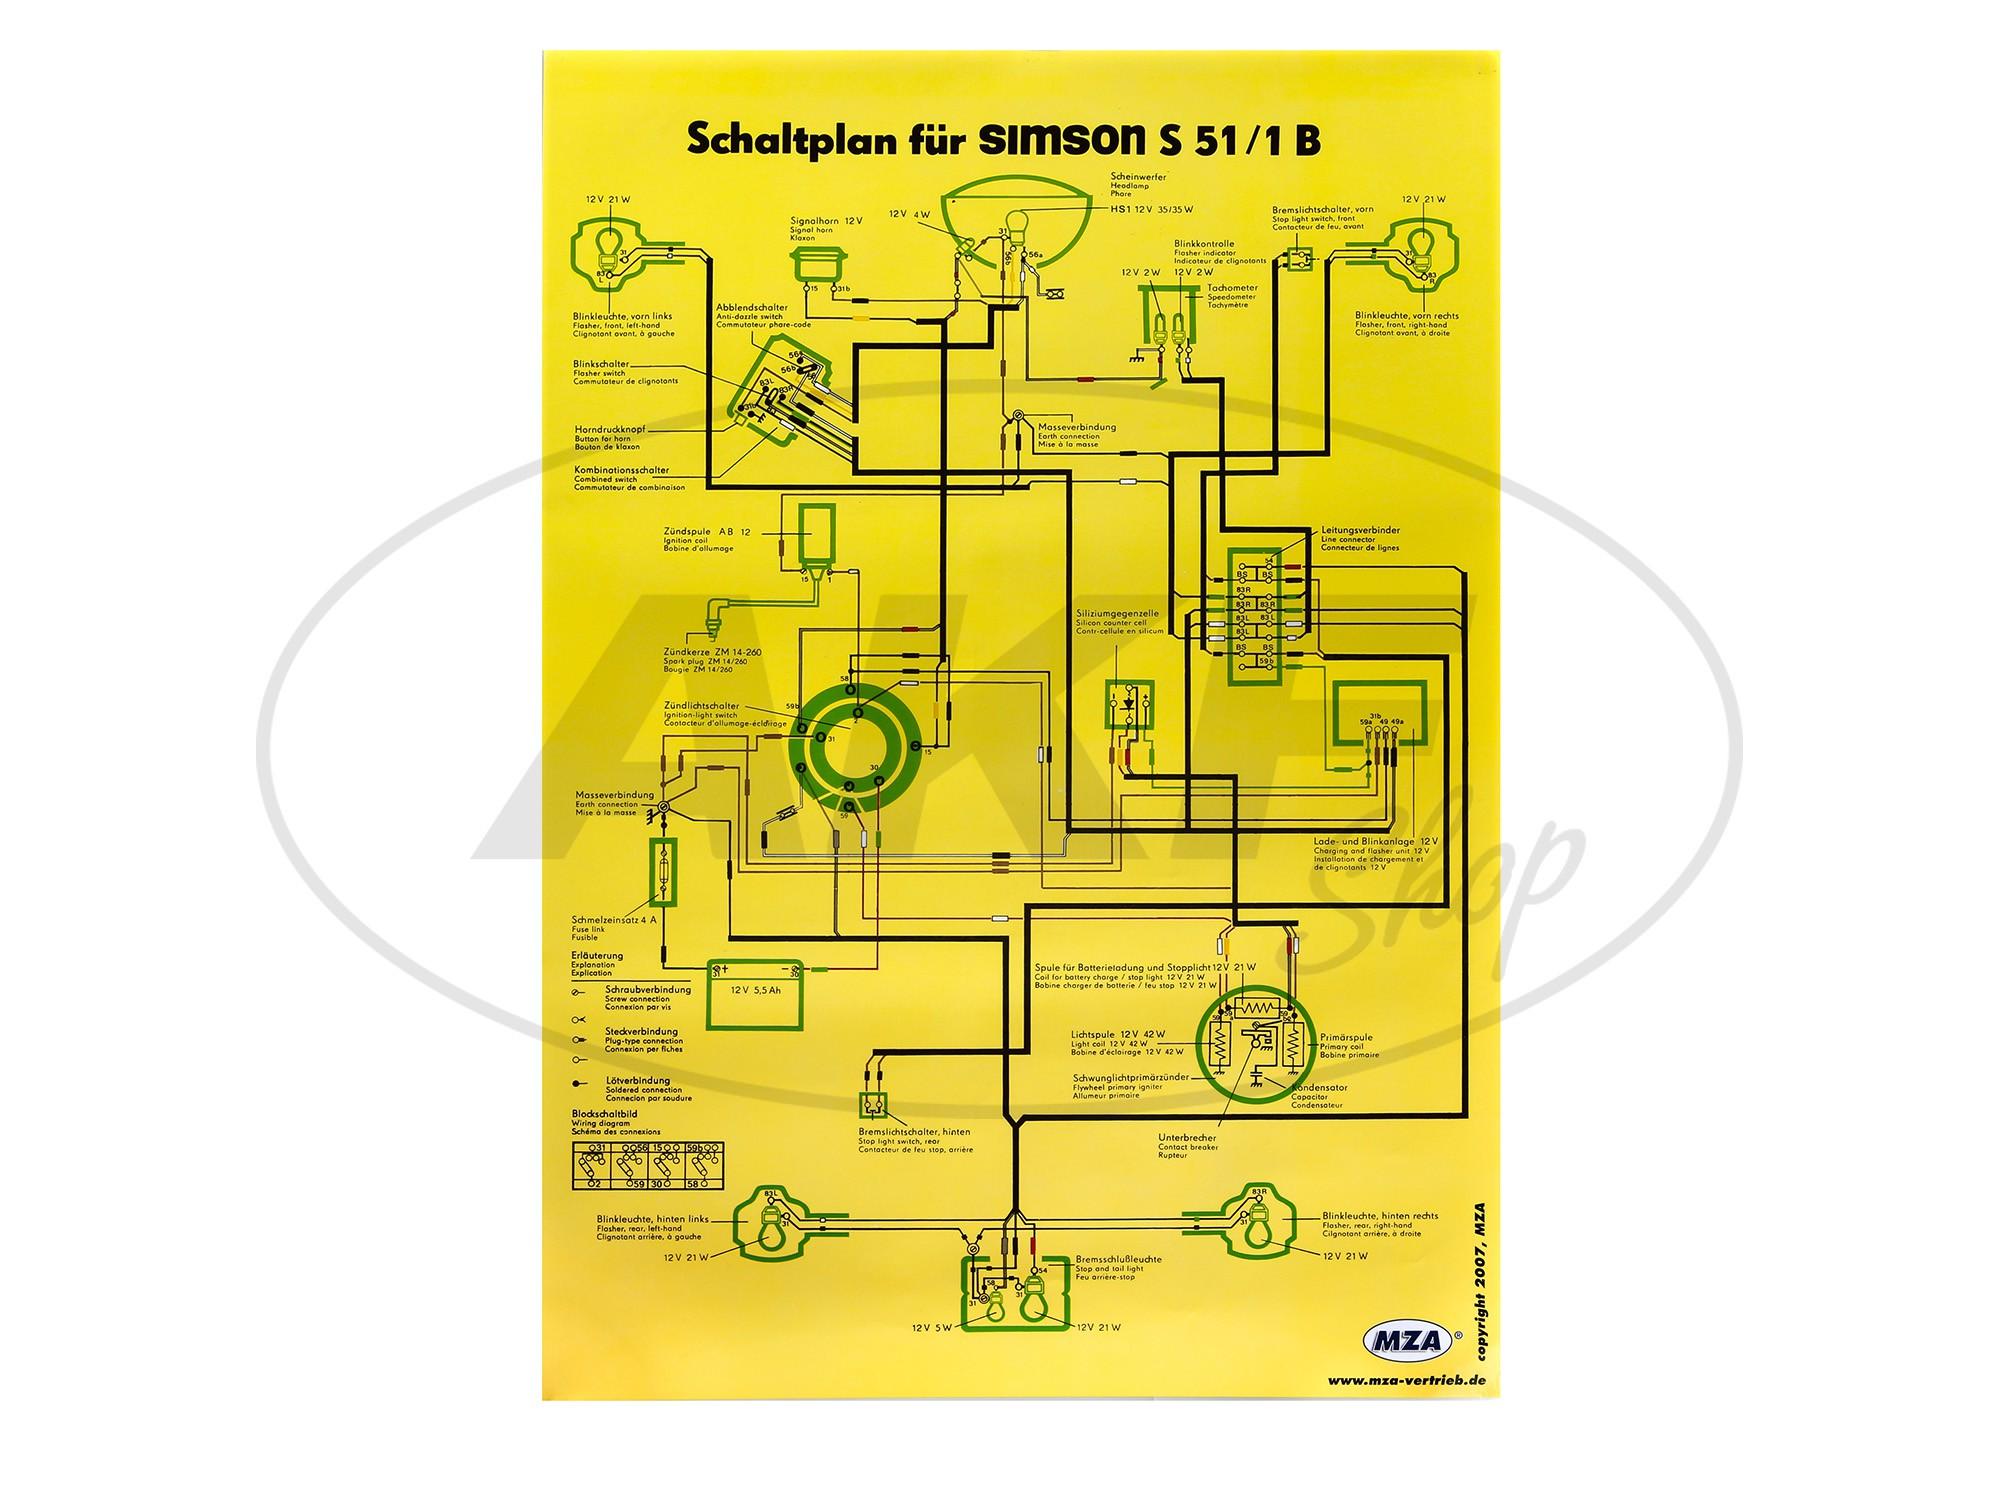 Schaltplan Farbposter (40x60cm) Simson S51/1B 12V